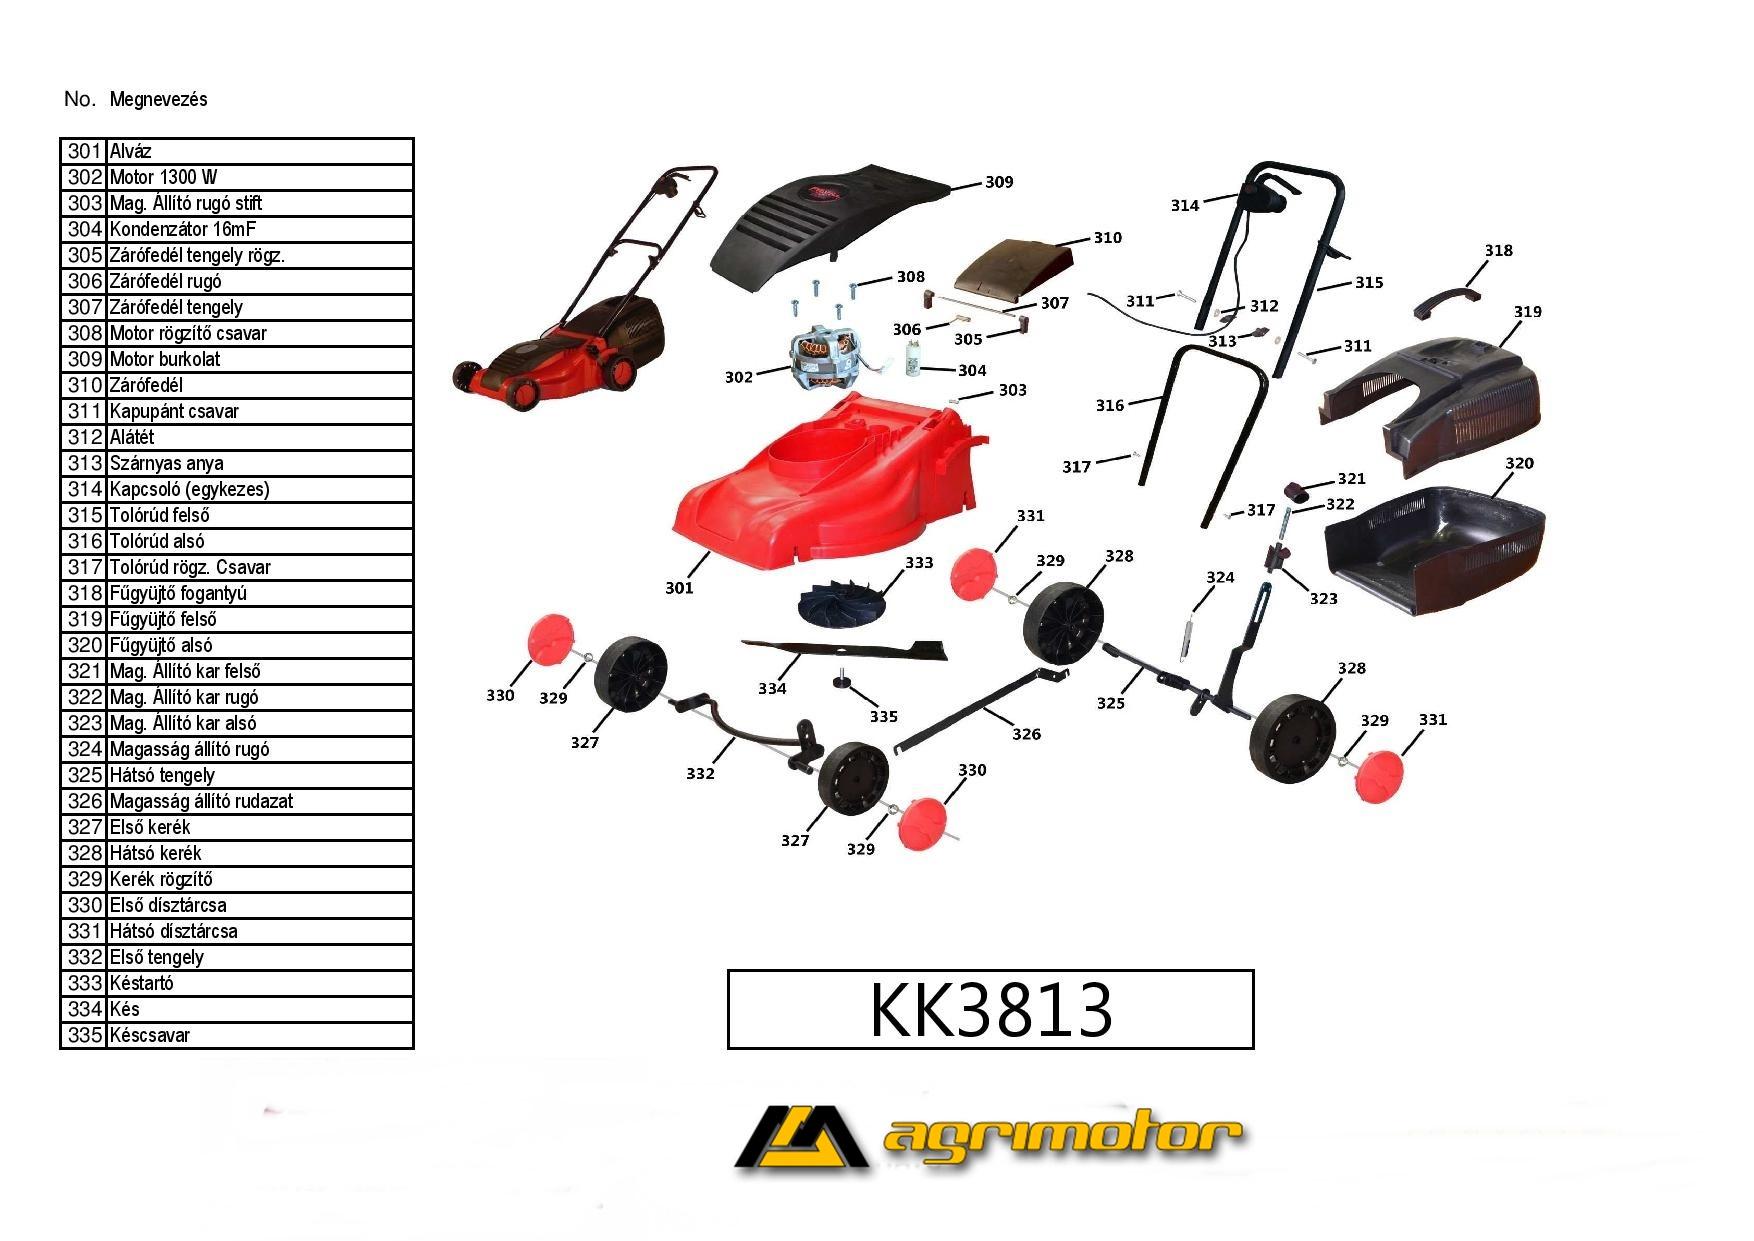 kk 38